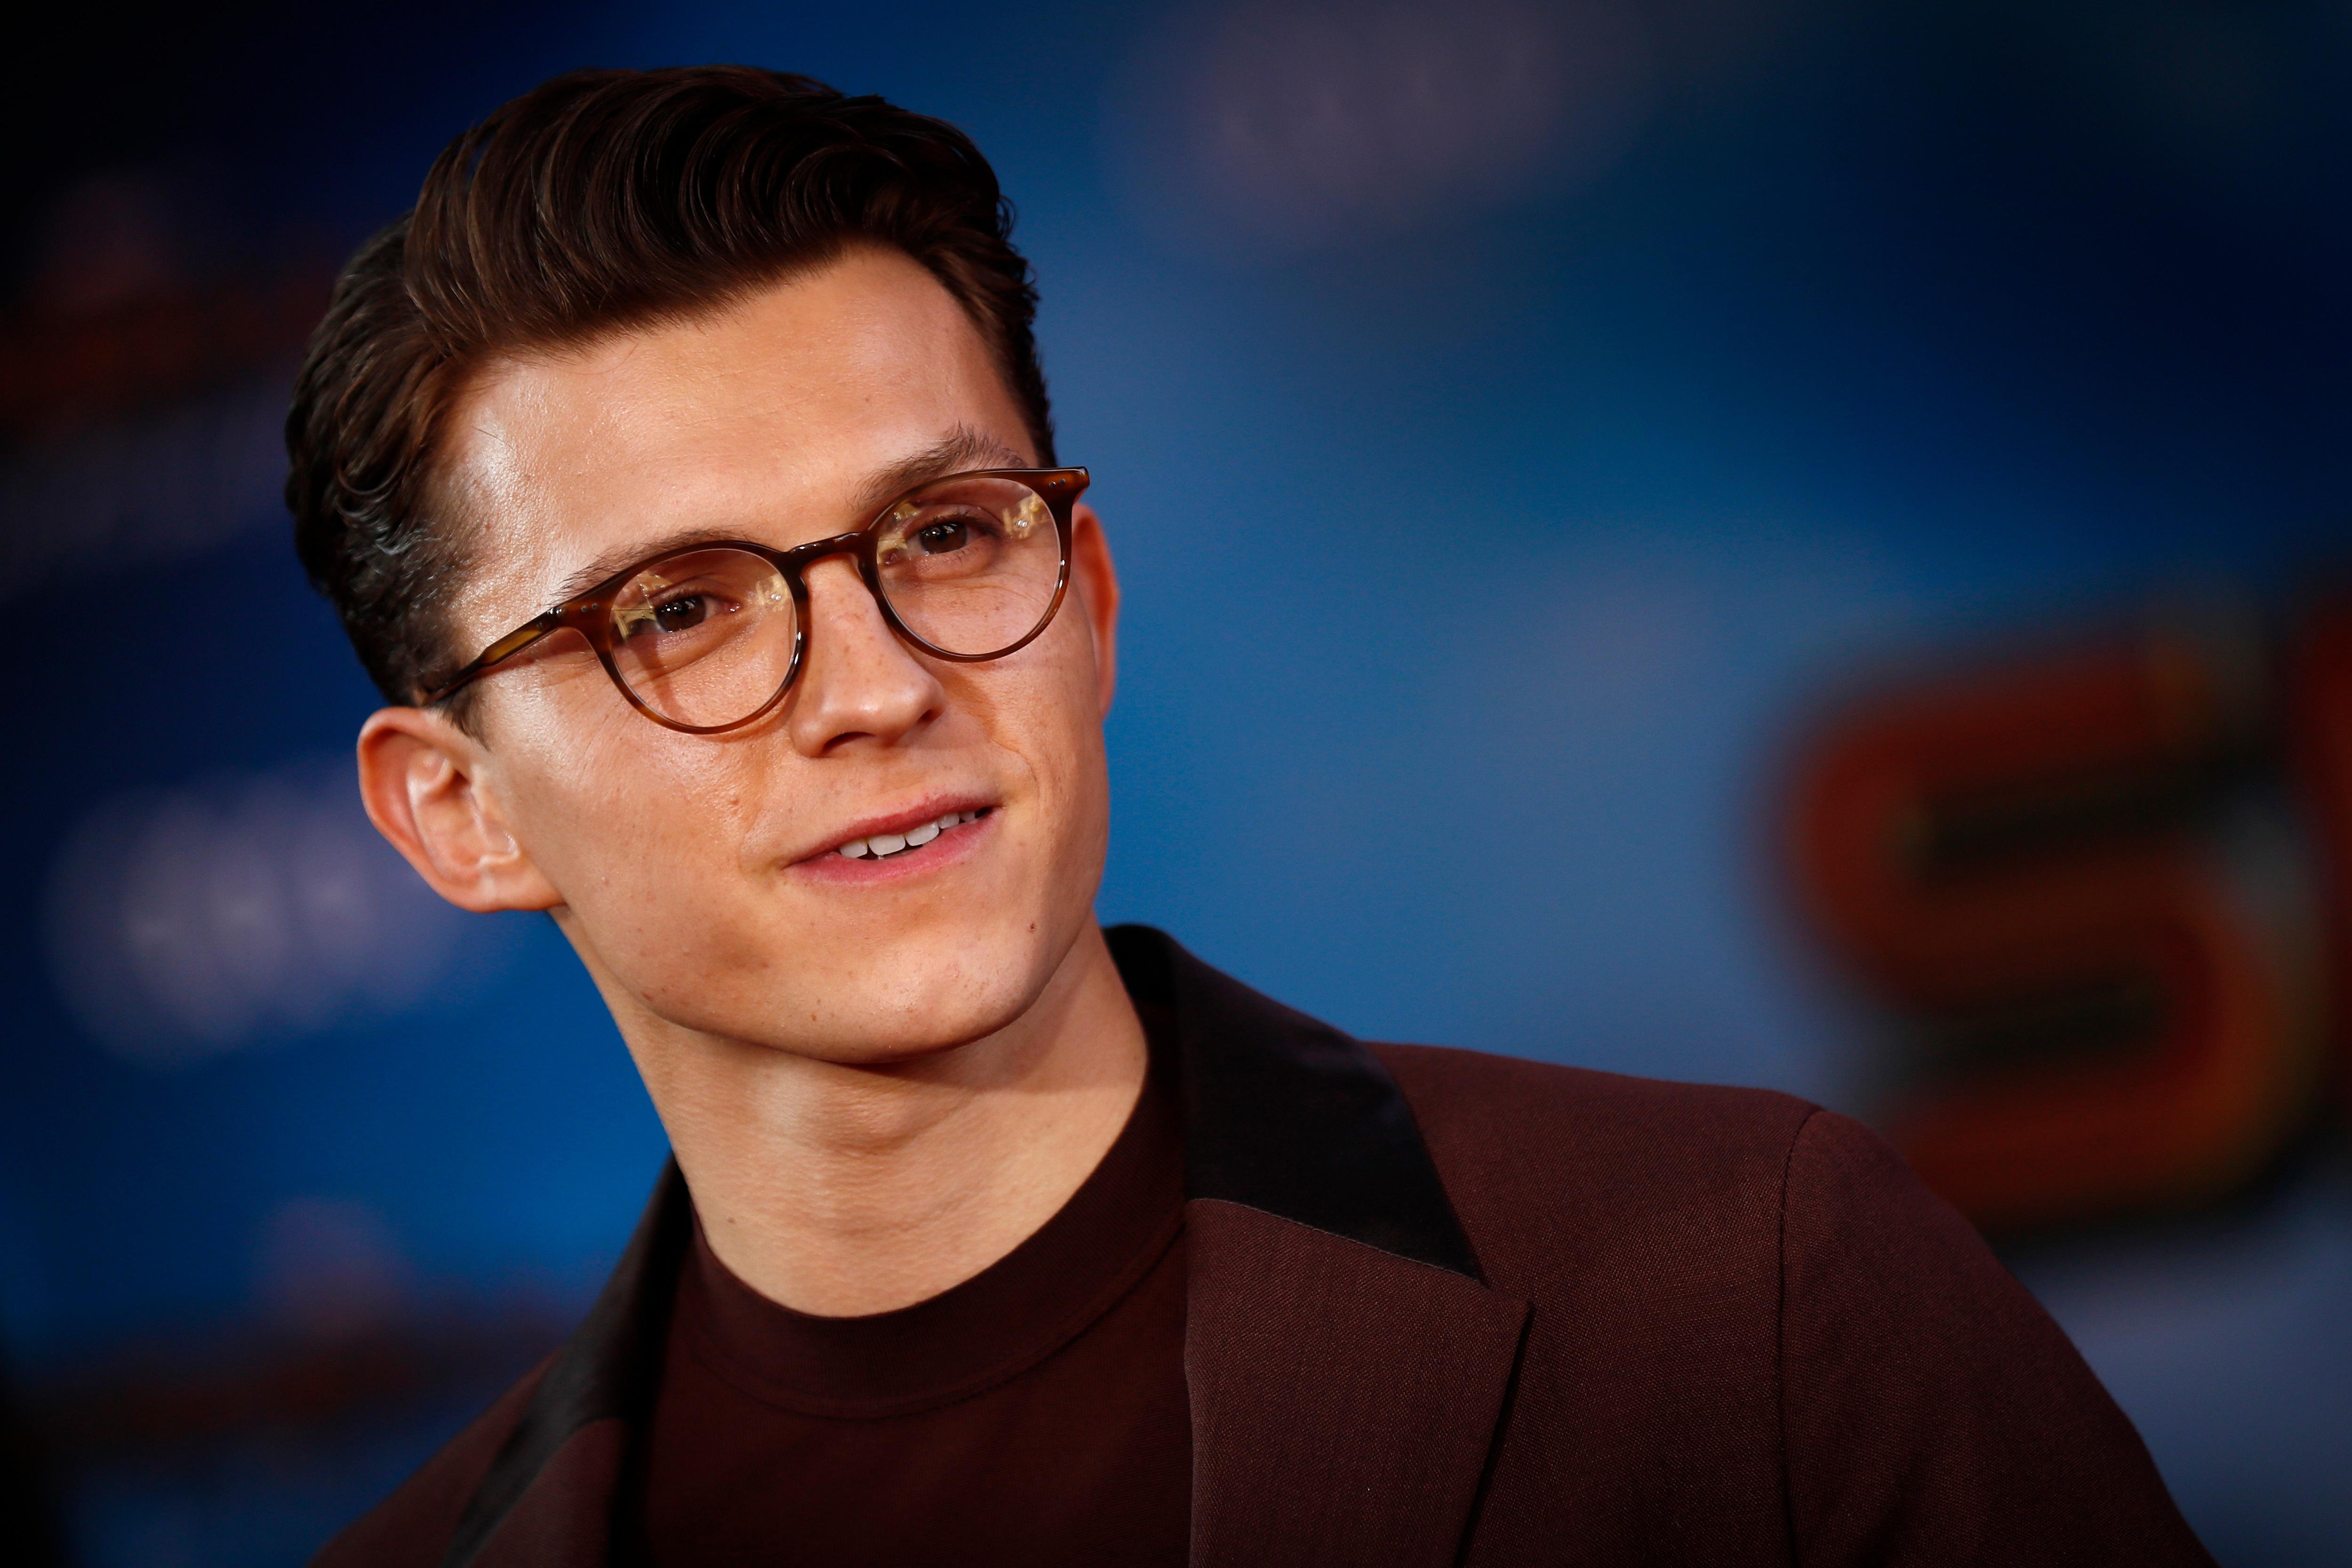 Tom Holland Celebrates 'Spider-Man' MCU Return